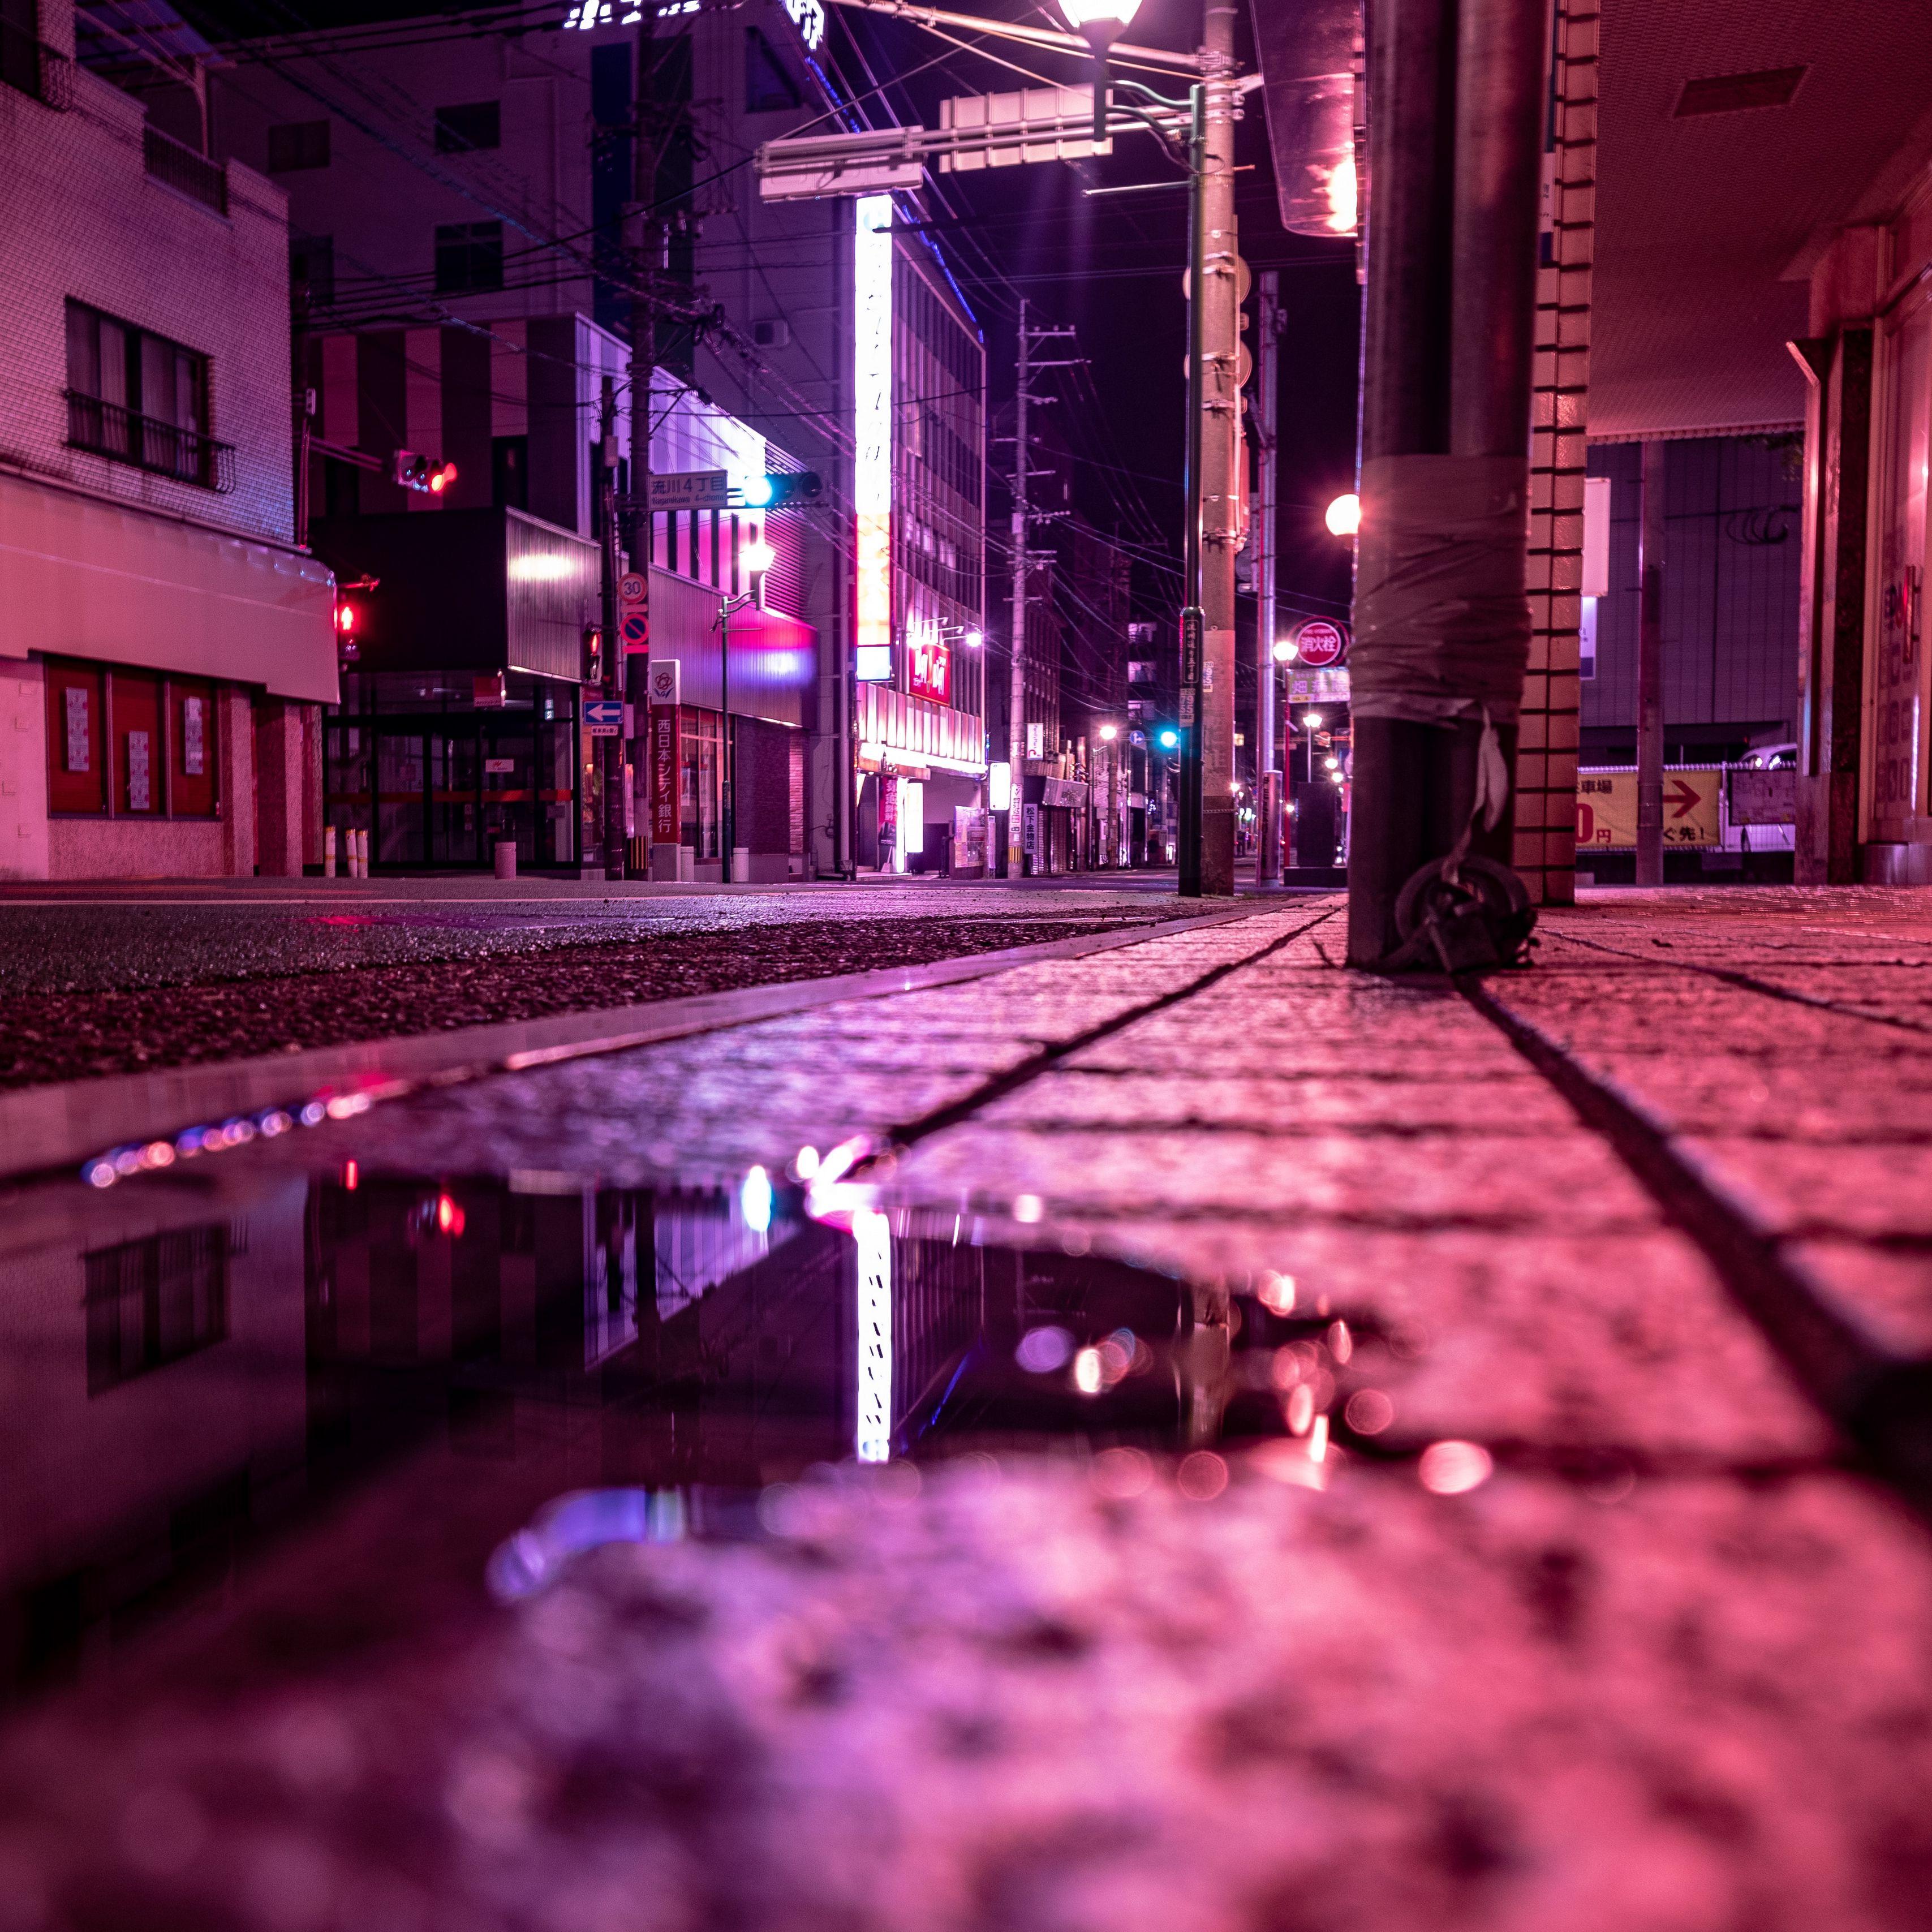 3415x3415 Wallpaper street, puddle, neon, light, night